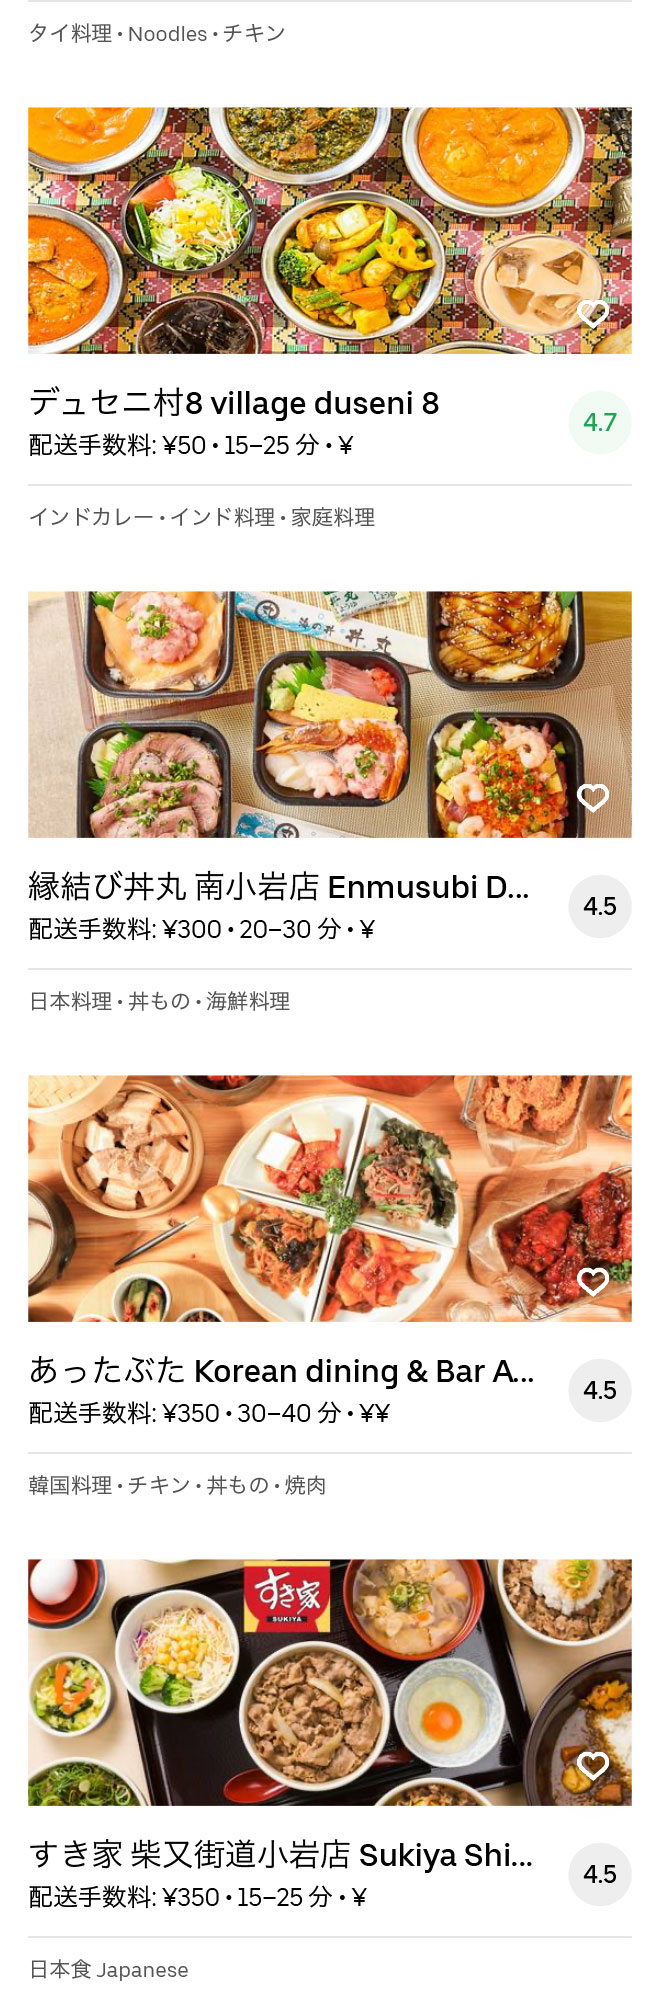 Ichikawa menu 2004 08